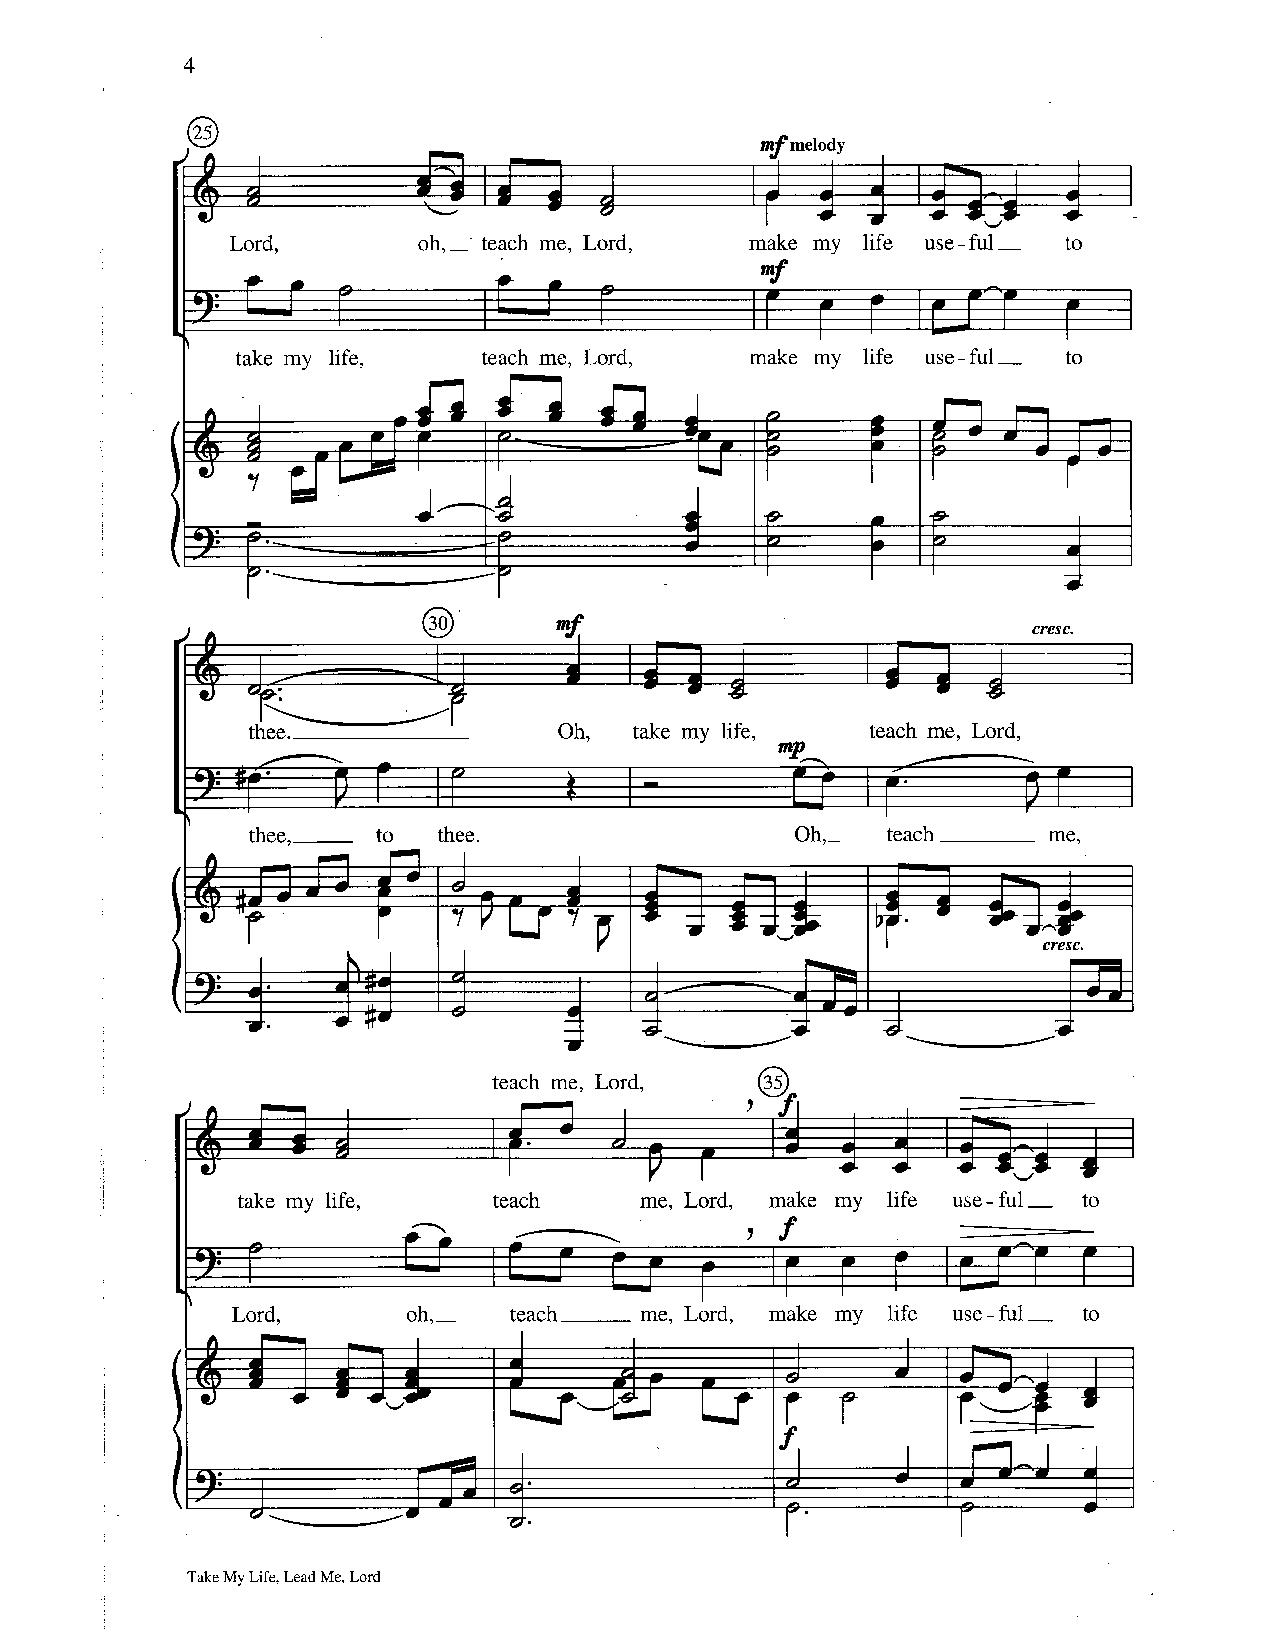 Take My Life Lead Me Lord Sab By Wilson J Jw Pepper Sheet Music